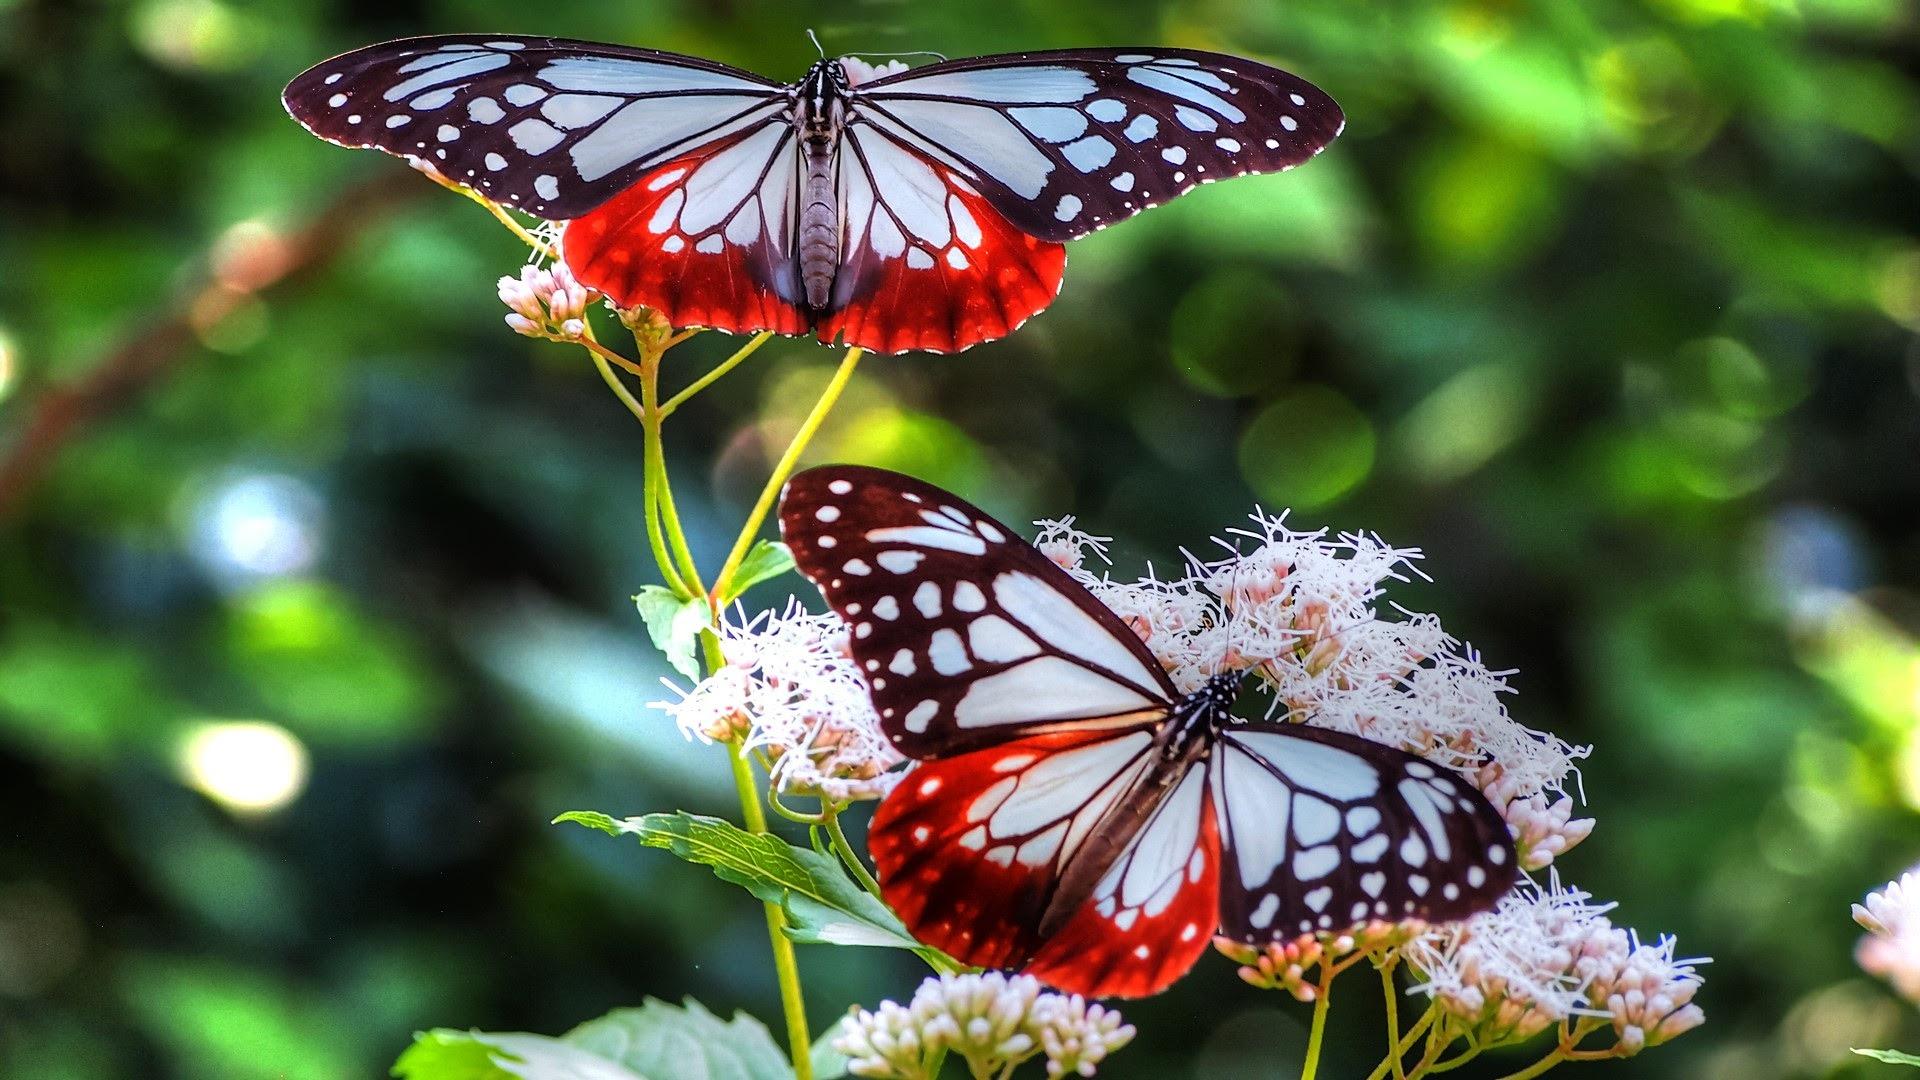 Beautiful Butterflies and Flowers Wallpapers - WallpaperSafari